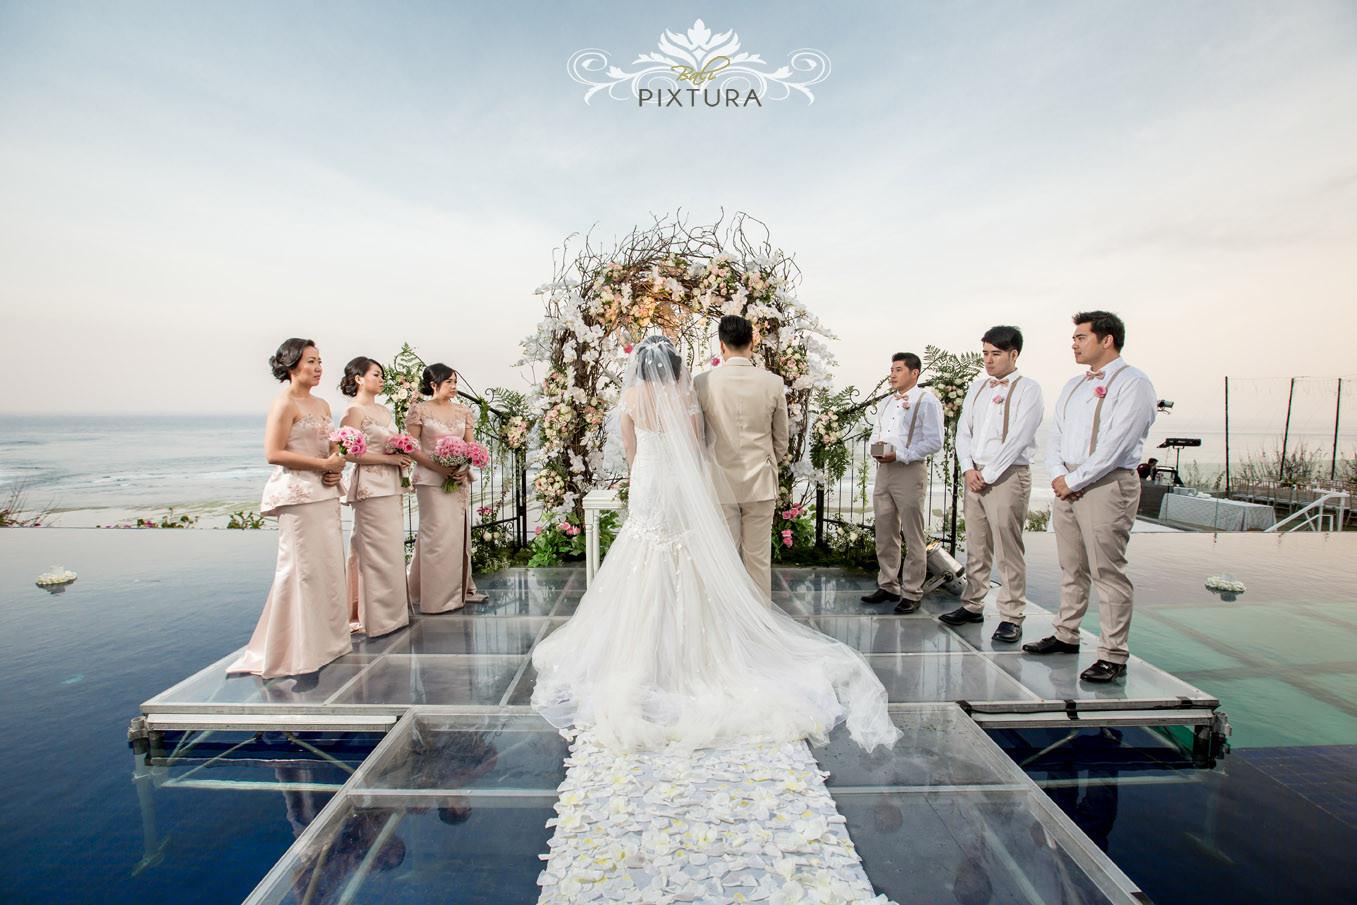 Spectacular Bali Wedding at the Stunning Soori Bali Resort